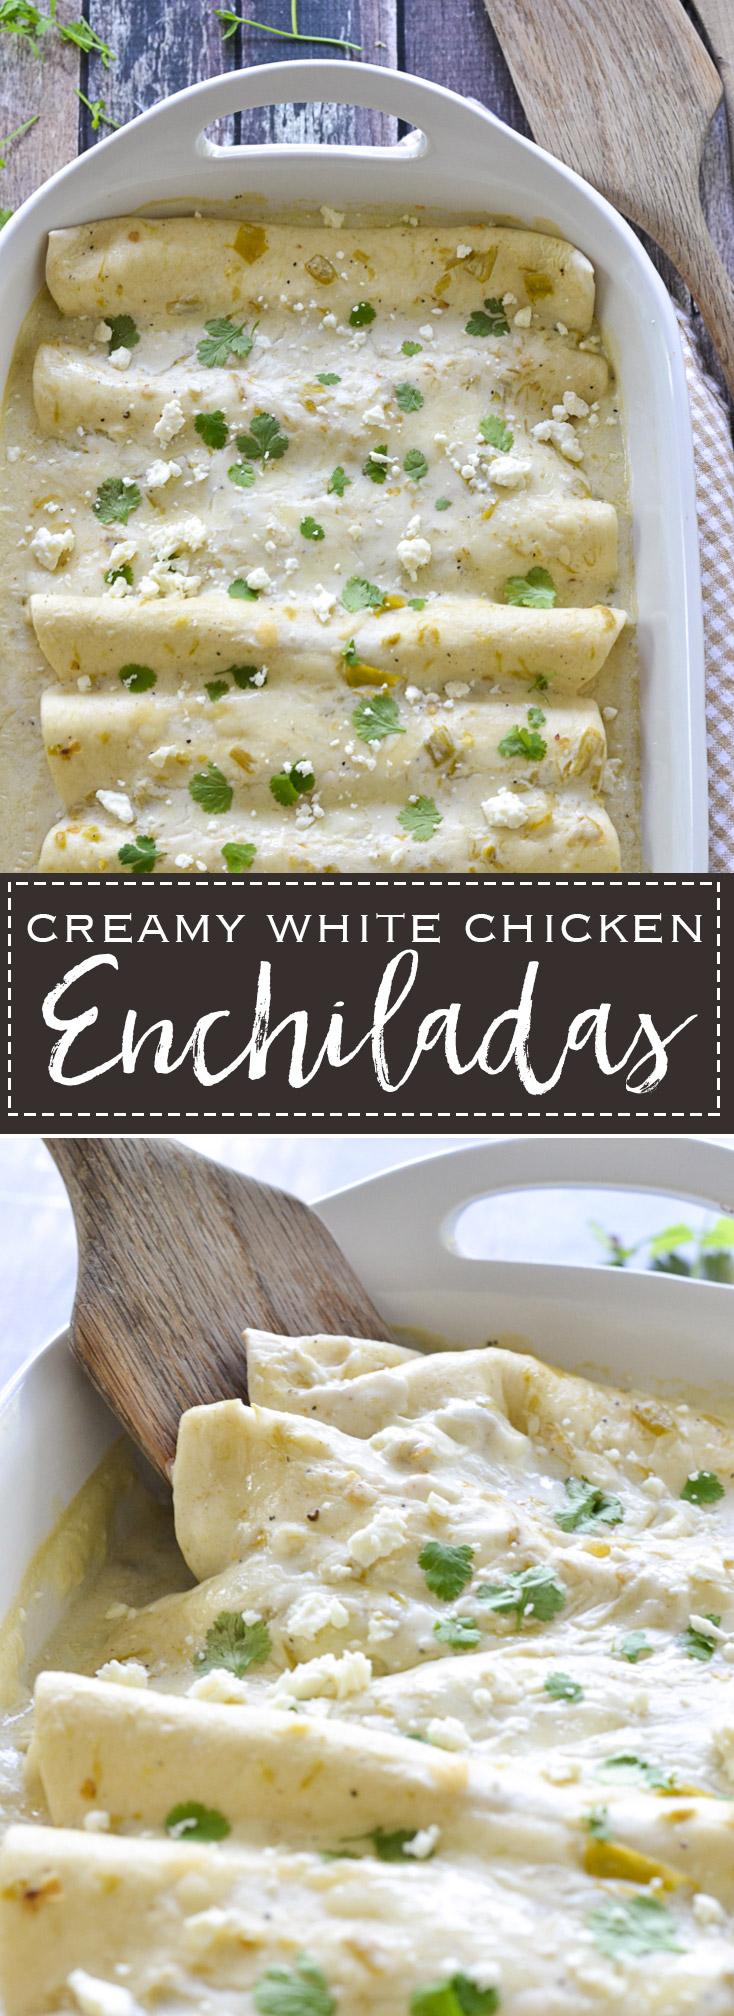 Creamy White Chicken Enchiladas | www.motherthyme.com